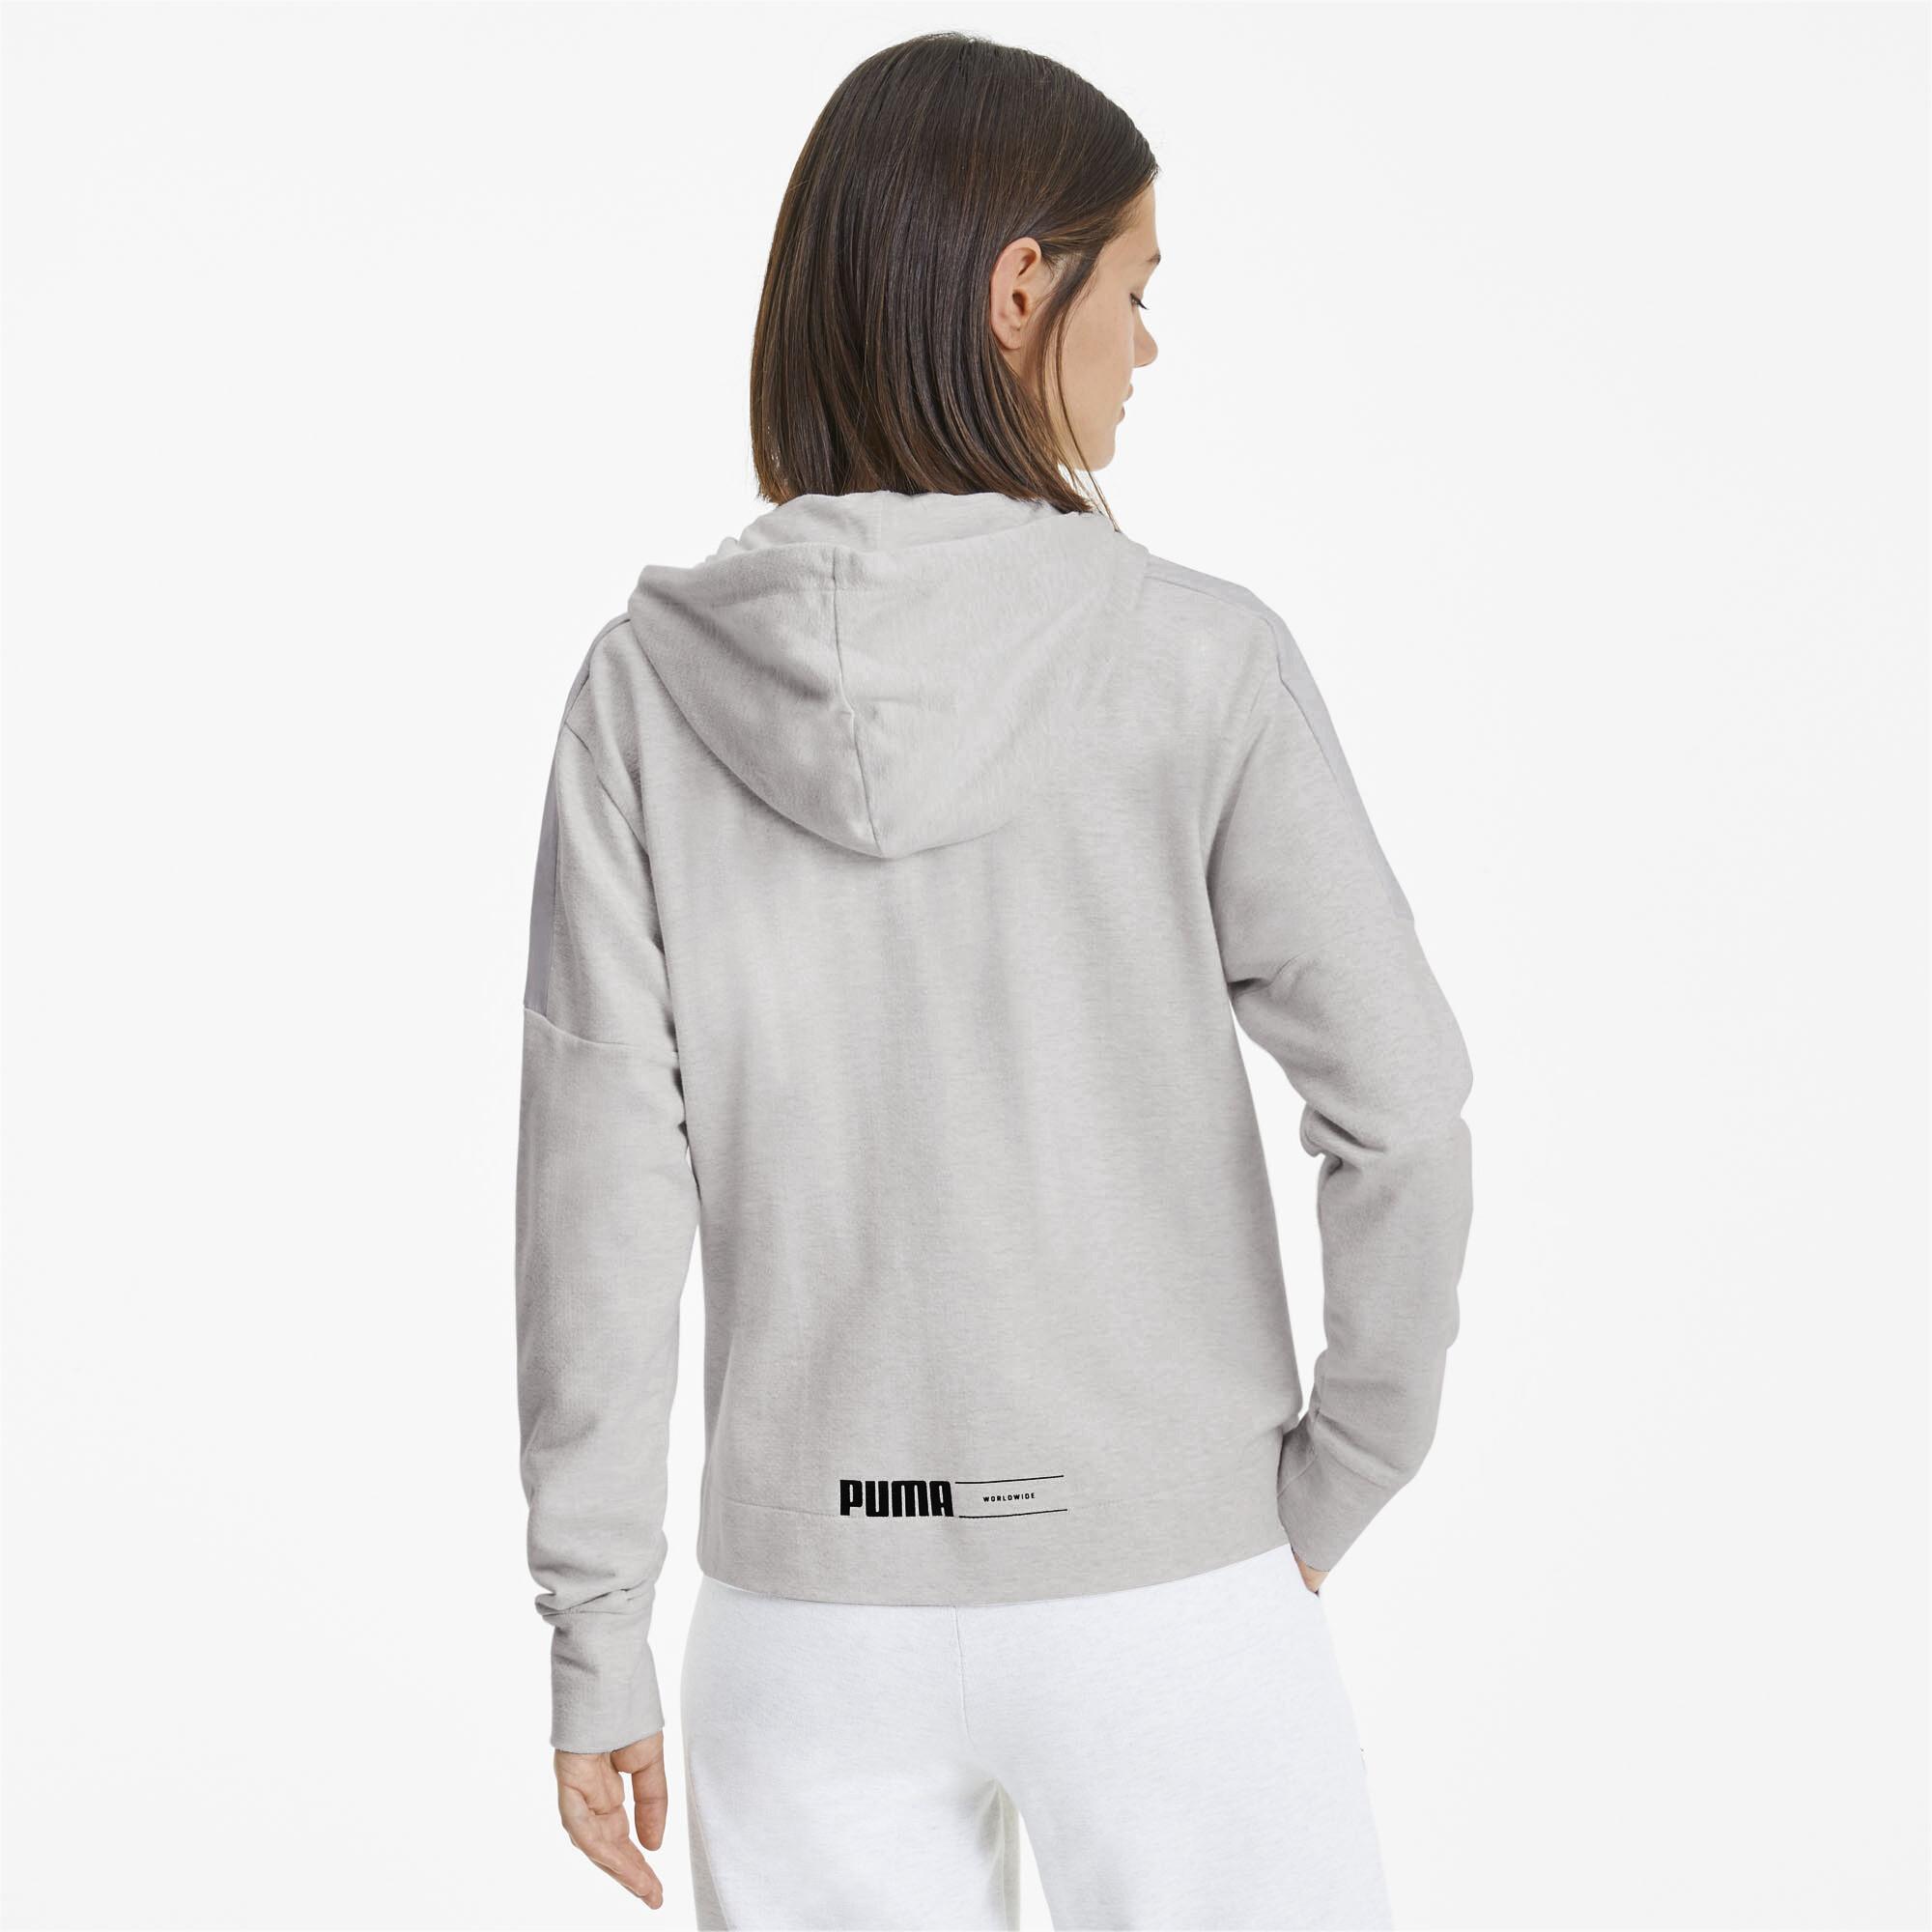 PUMA-NU-TILITY-Women-039-s-Full-Zip-Hoodie-Women-Sweat-Basics miniatuur 16